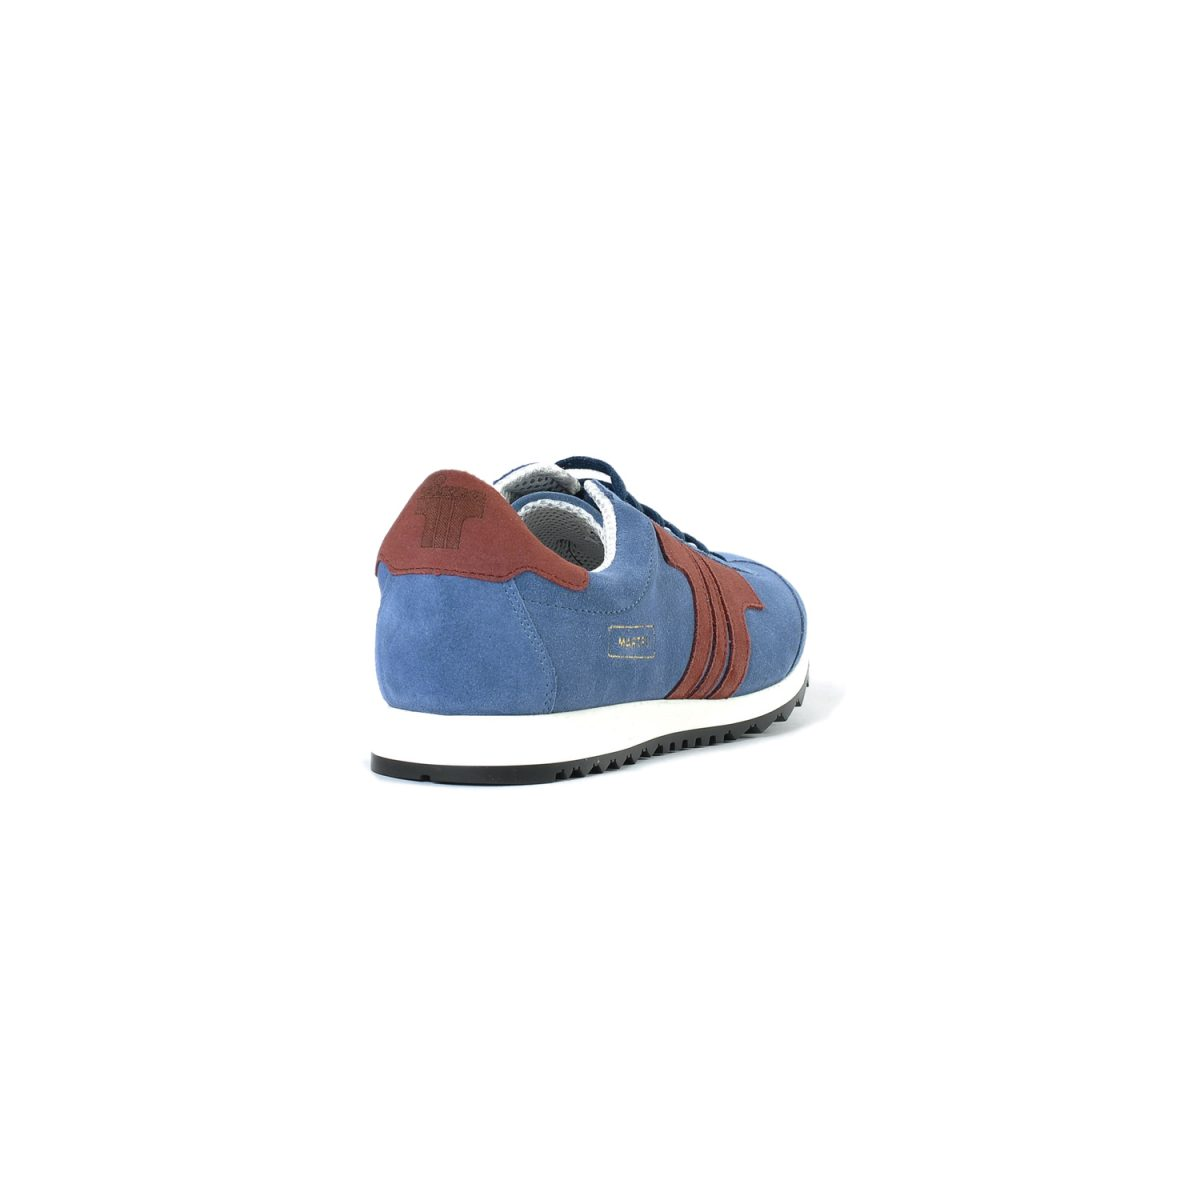 Tisza cipő - Martfű - Farmer-gesztenye